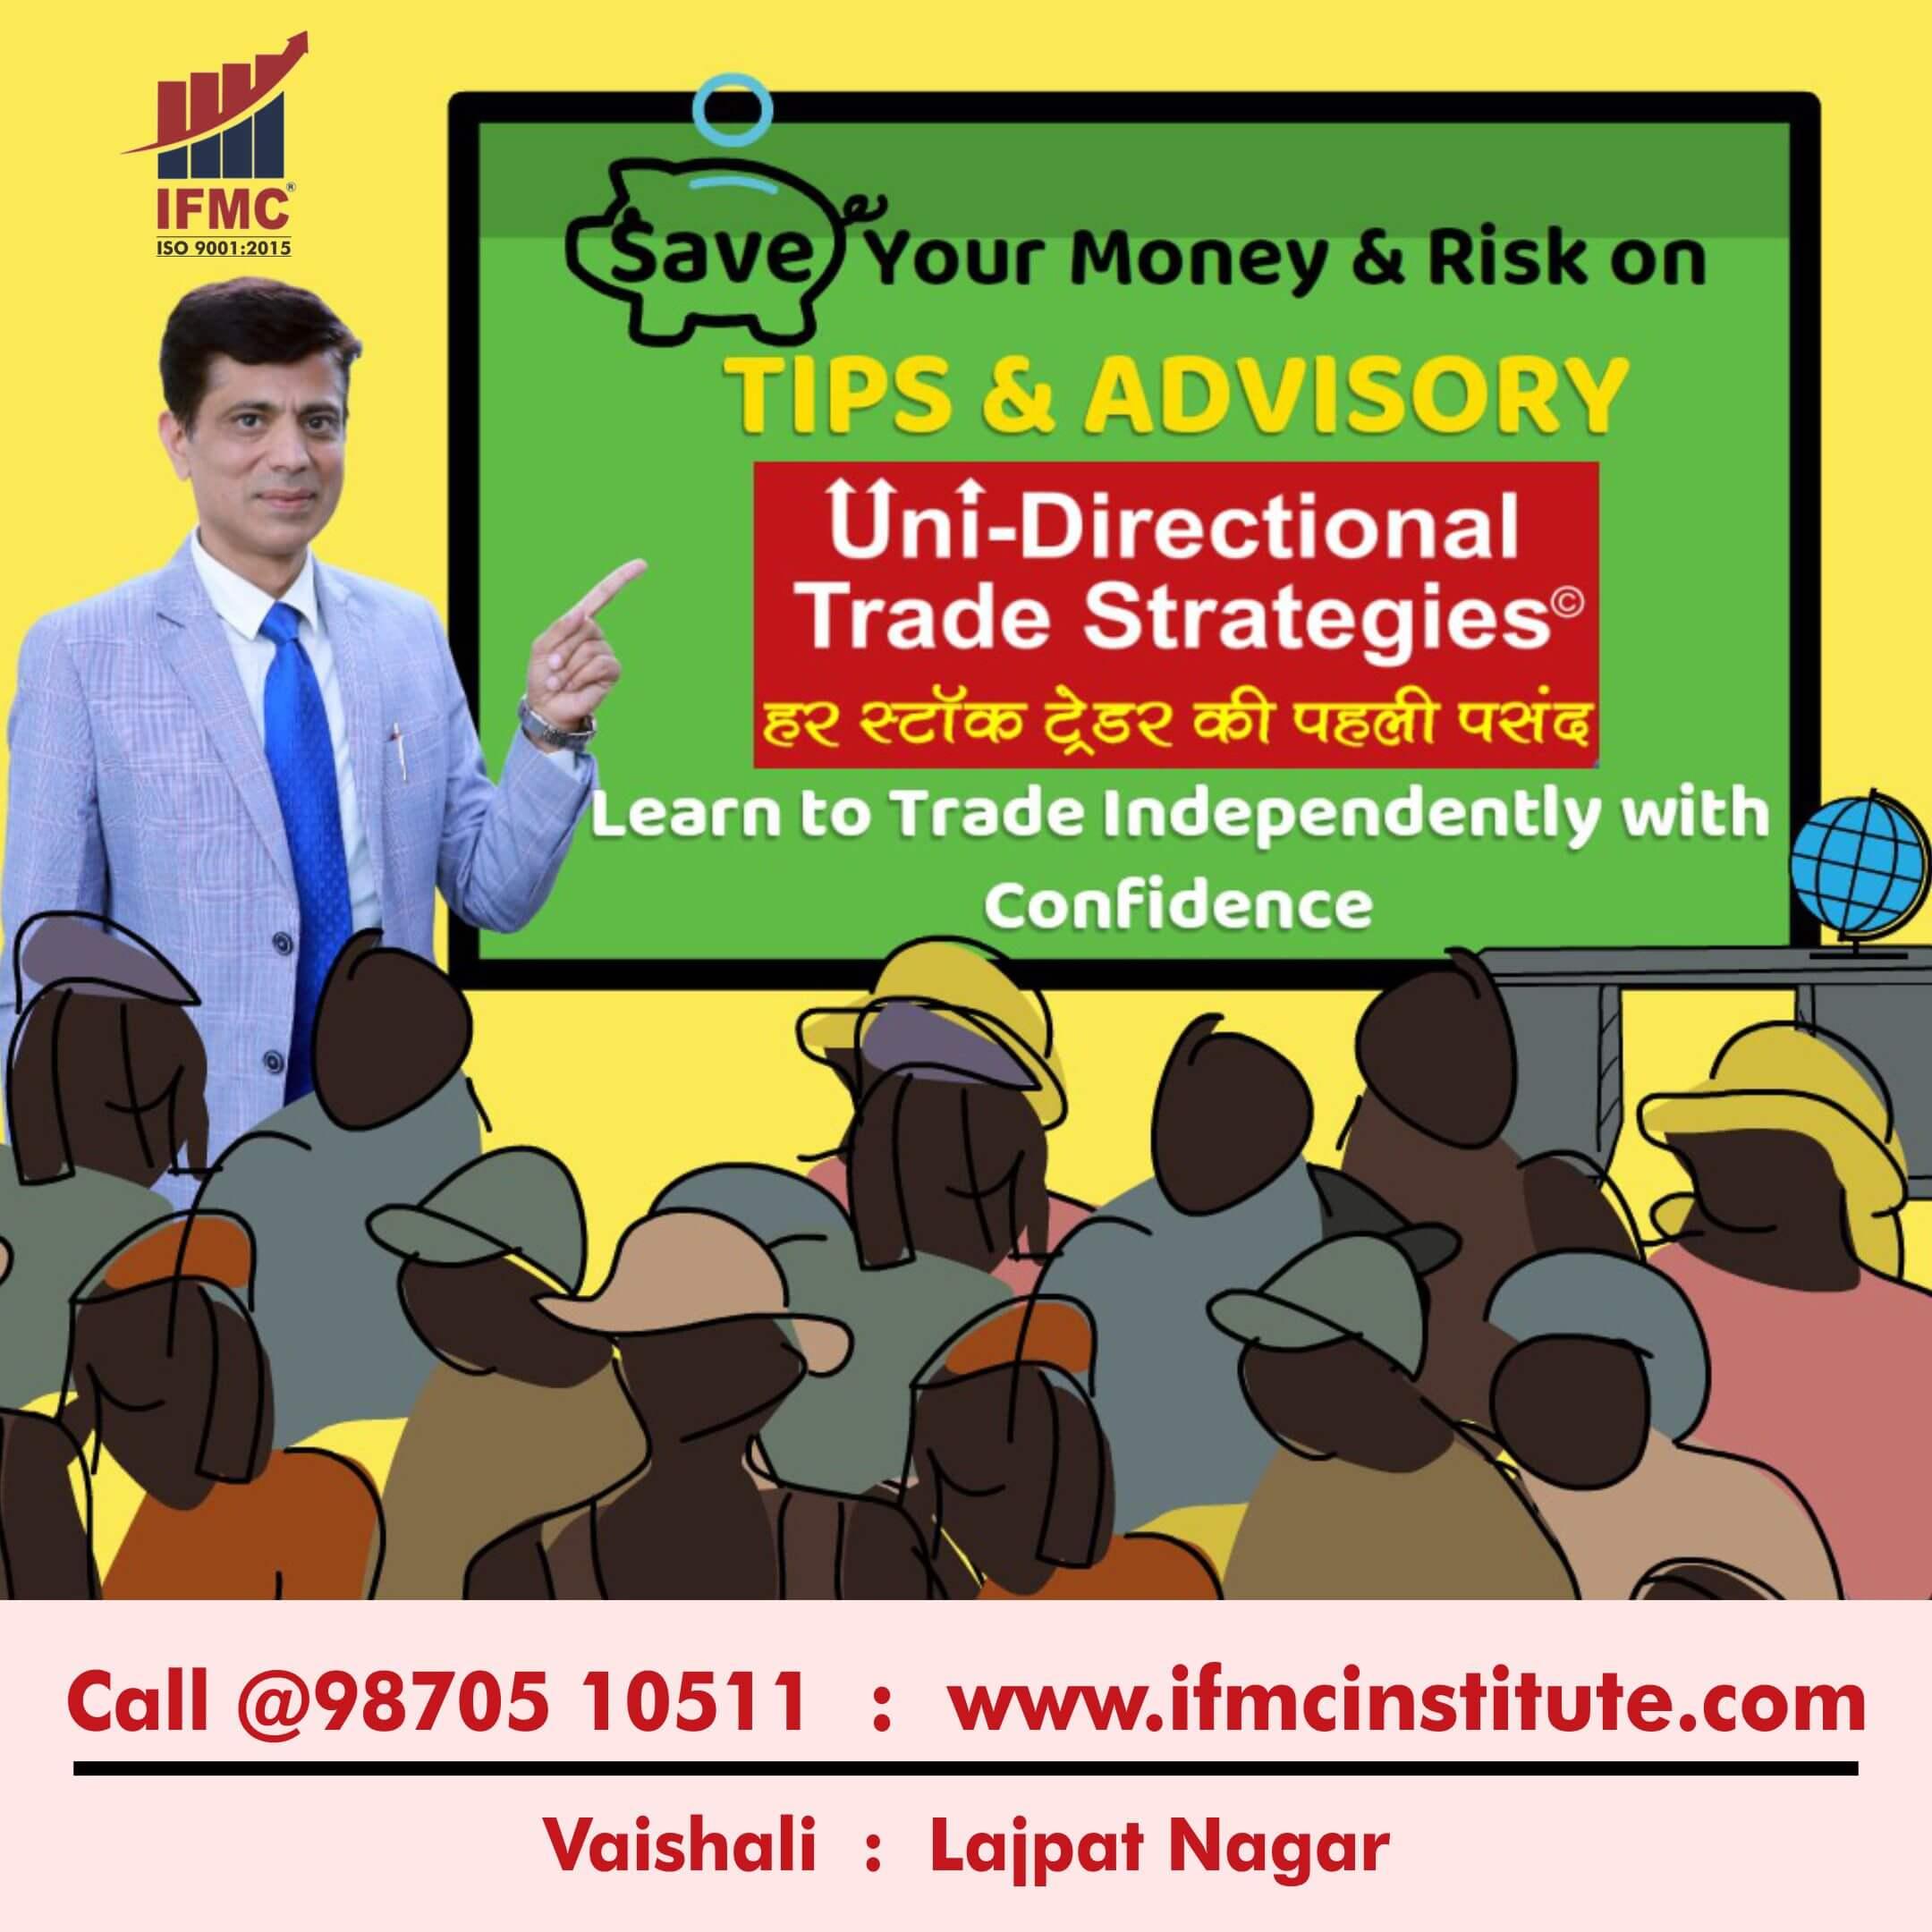 IFMC Tips & Advisory A